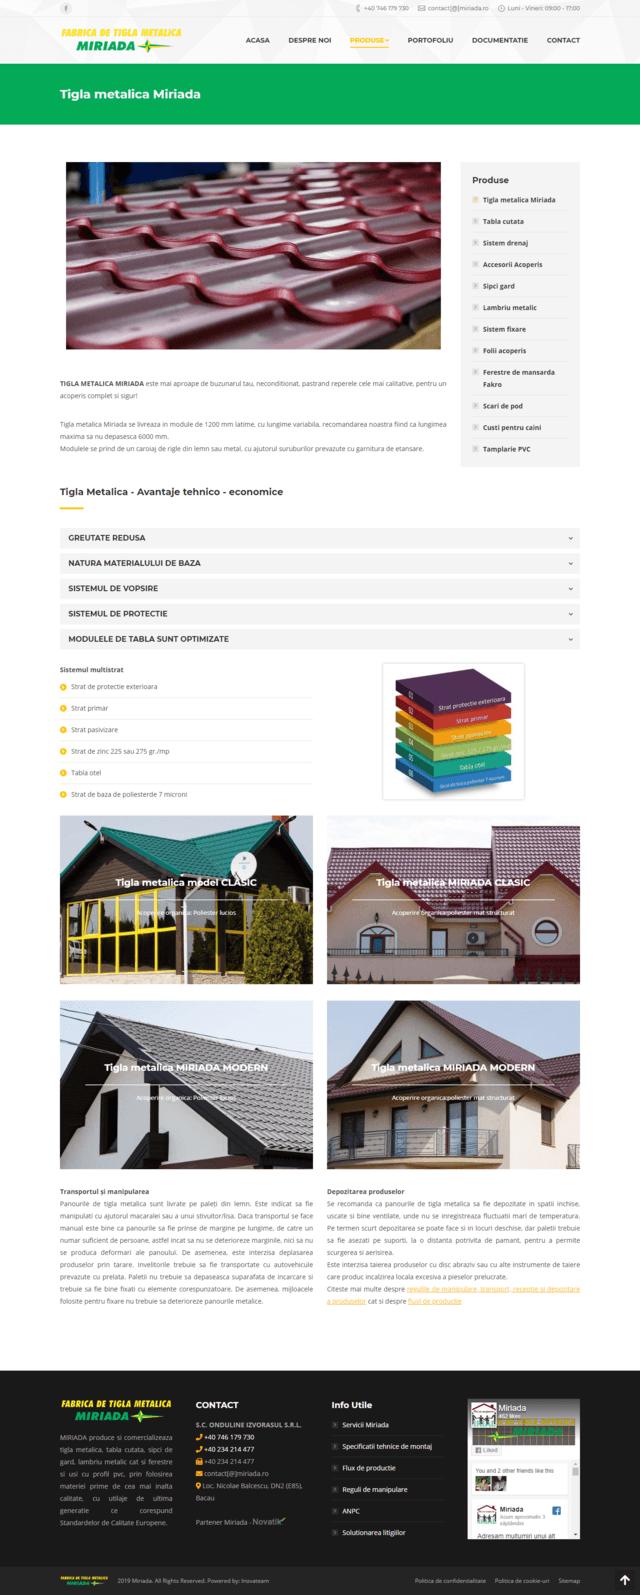 servicii web design - miriada.ro (9)